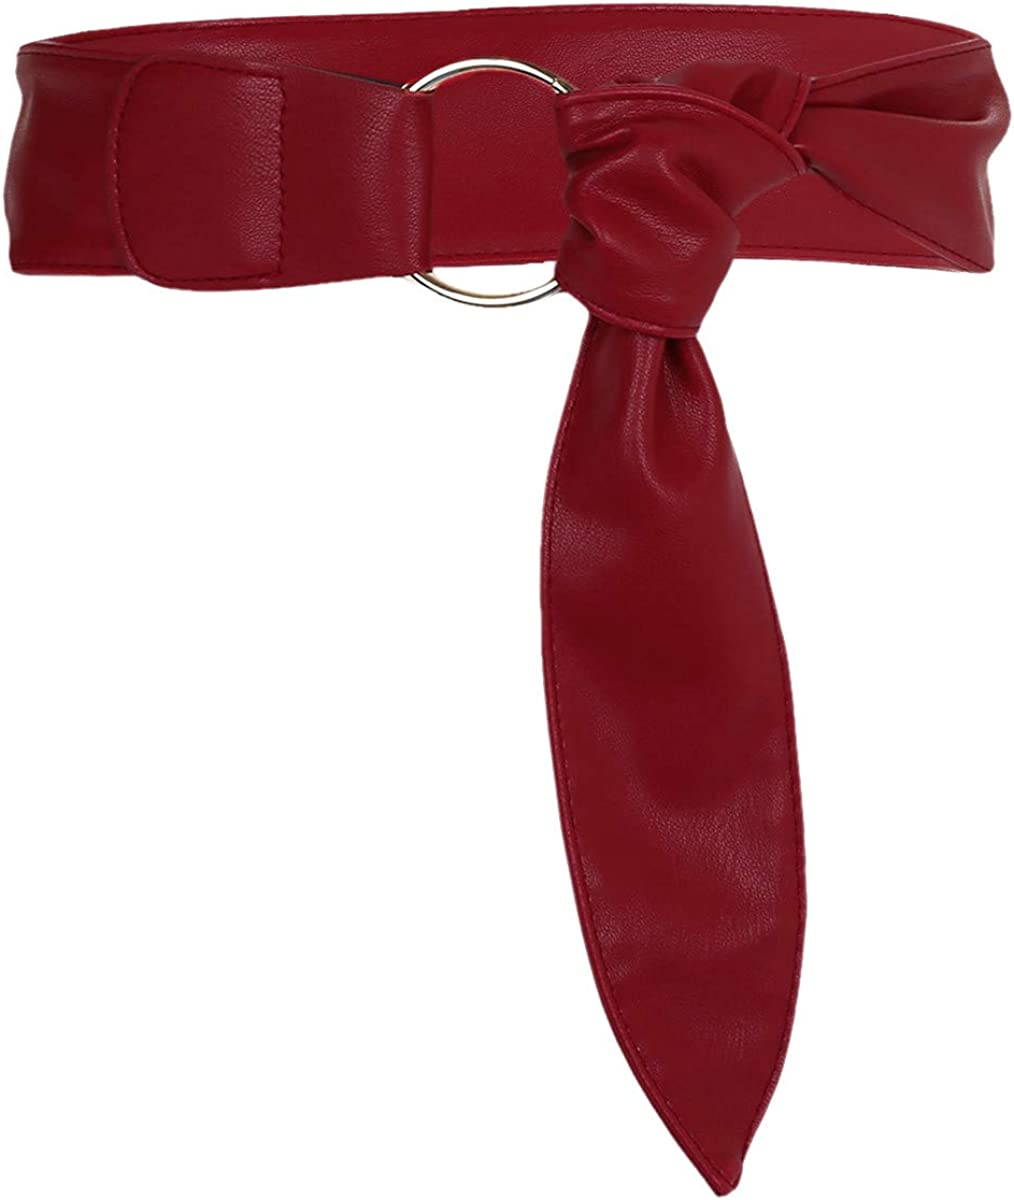 Samtree Dress Belt £¬Solid...